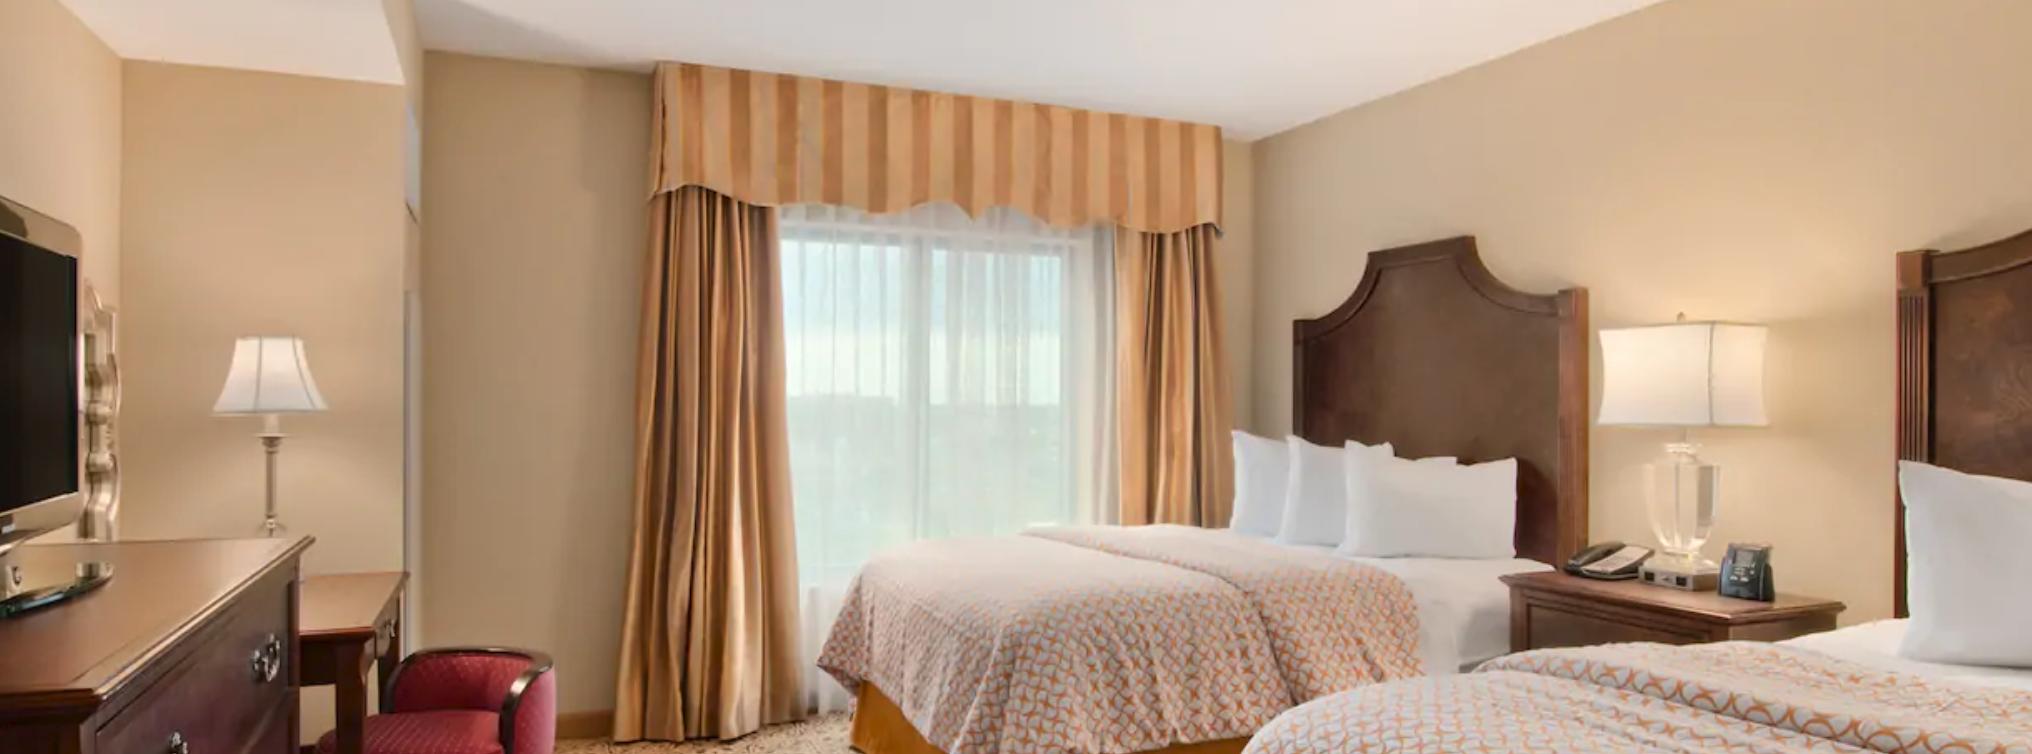 https://www.hotelsbyday.com/_data/default-hotel_image/4/20556/screenshot-2020-08-14-at-12-37-48-pm.png